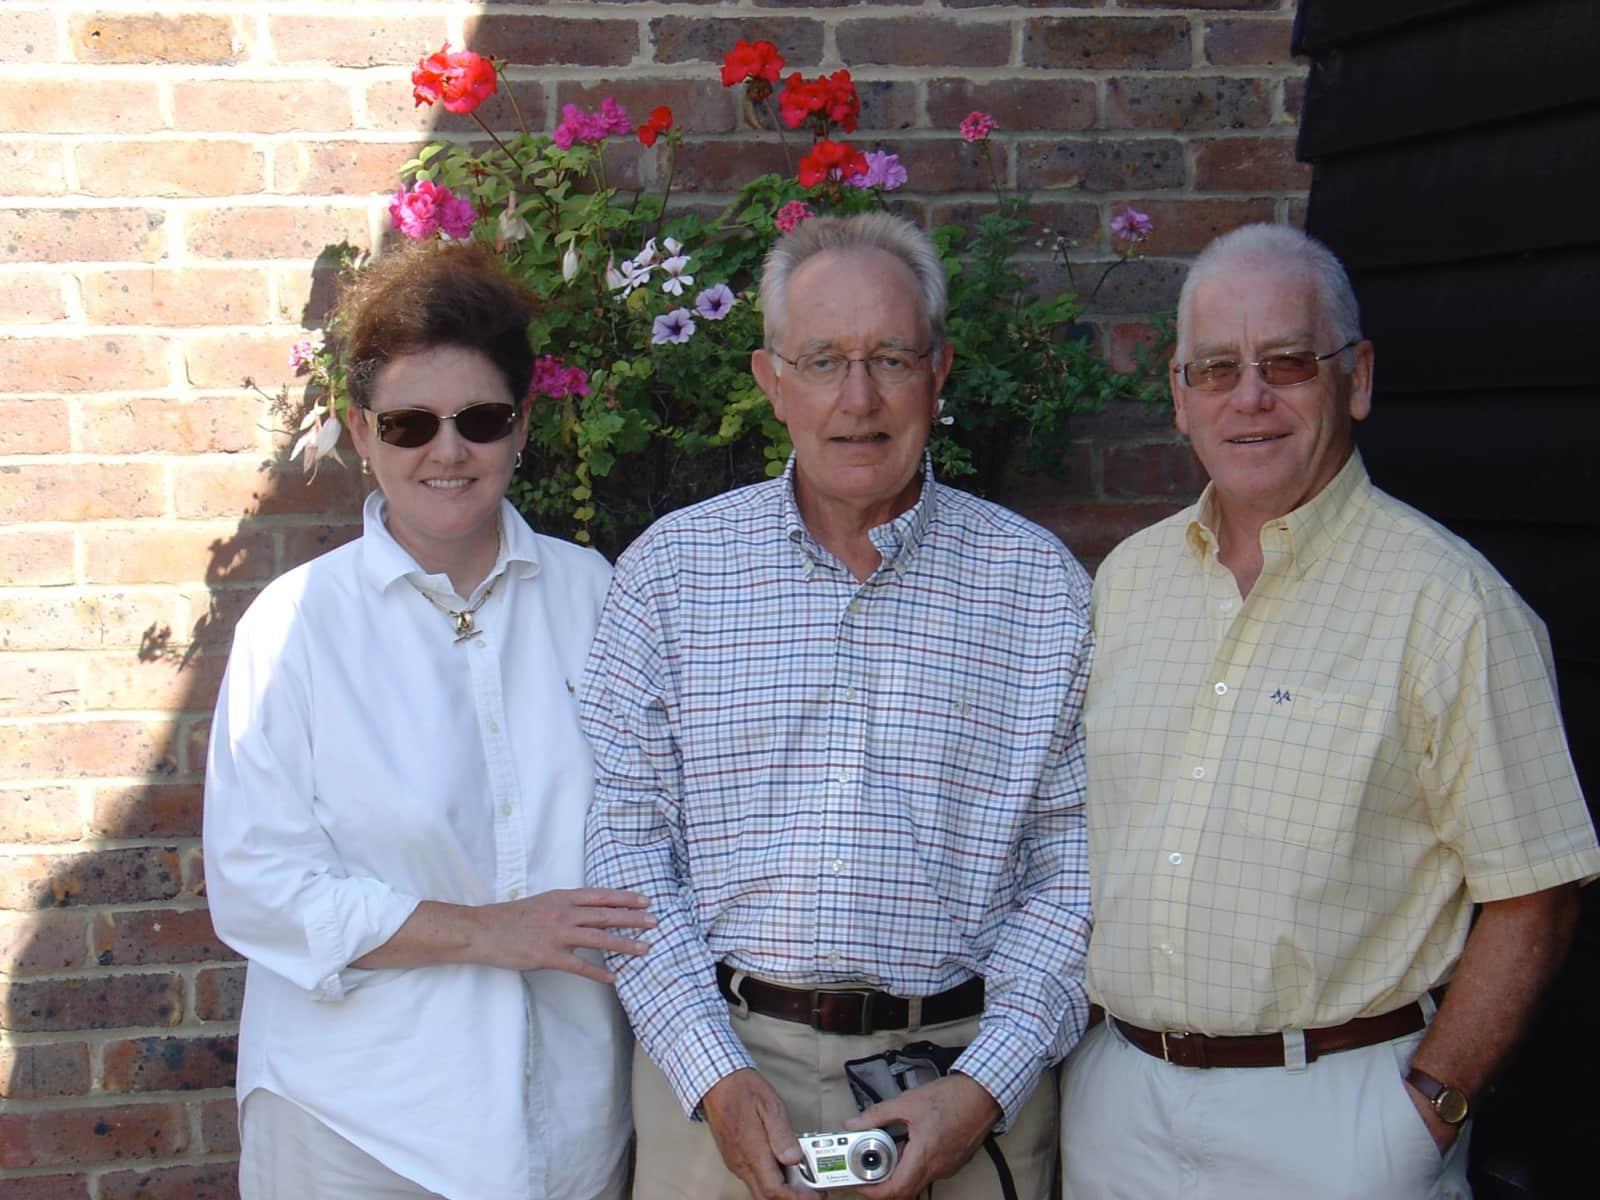 Chris & Elizabeth from Sydney, New South Wales, Australia